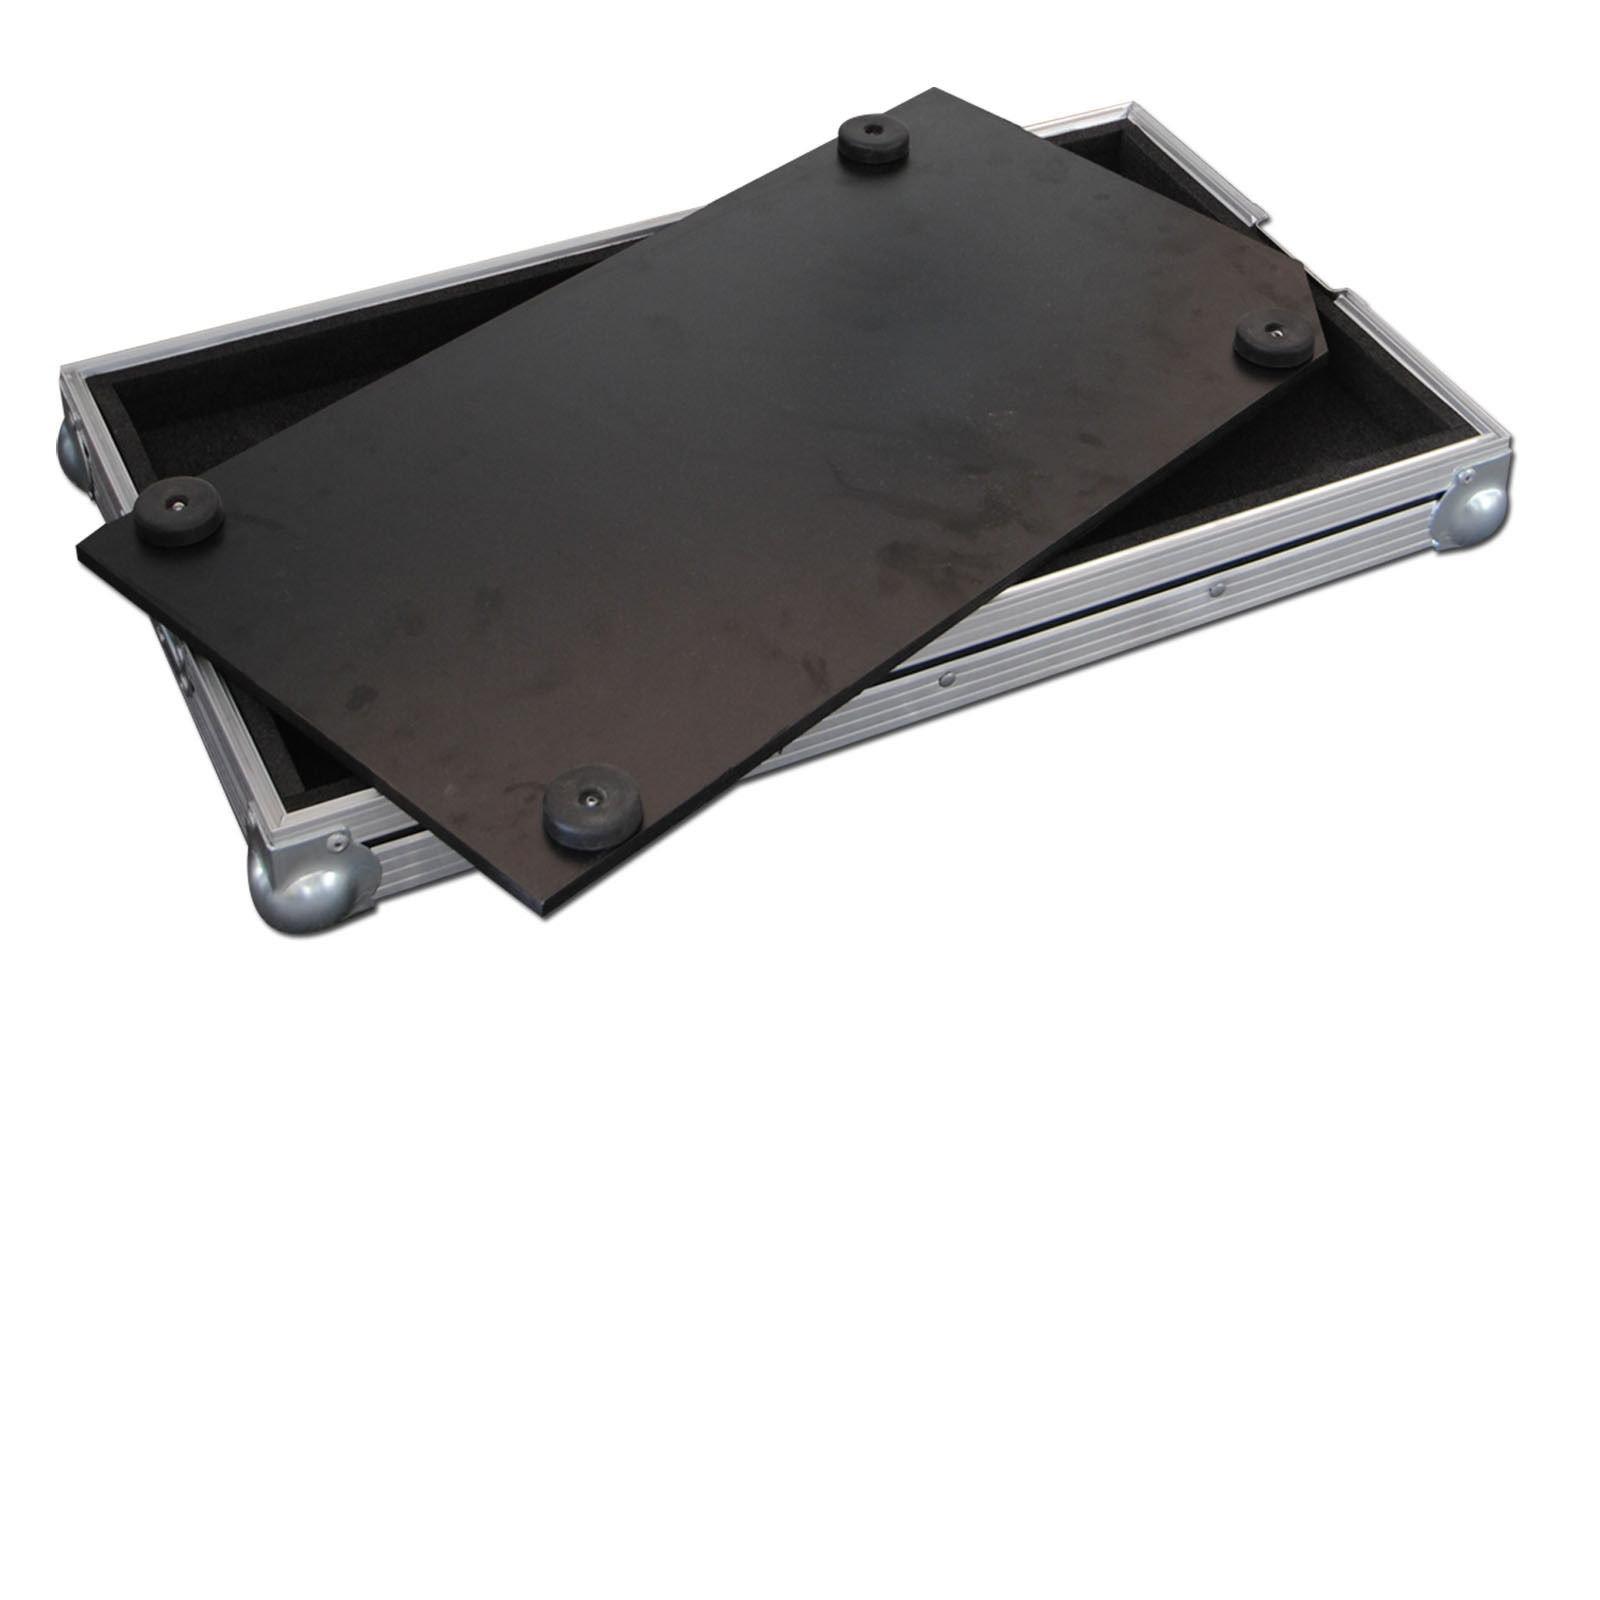 guitar effects pedal board flight case small. Black Bedroom Furniture Sets. Home Design Ideas